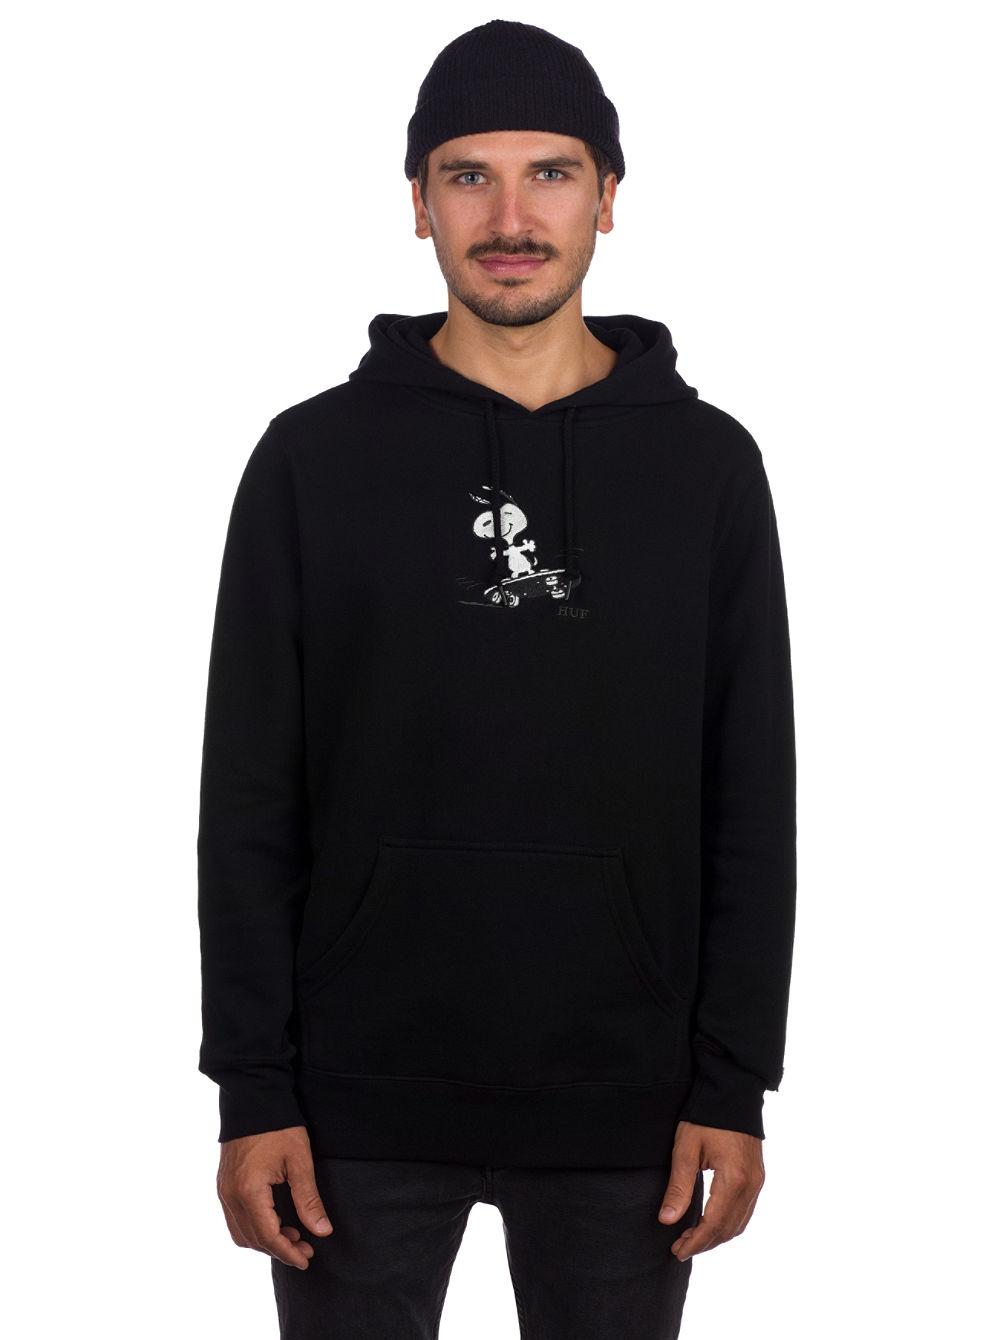 baf346ed9c Buy HUF X Peanuts Snoopy Skates Hoodie online at Blue Tomato